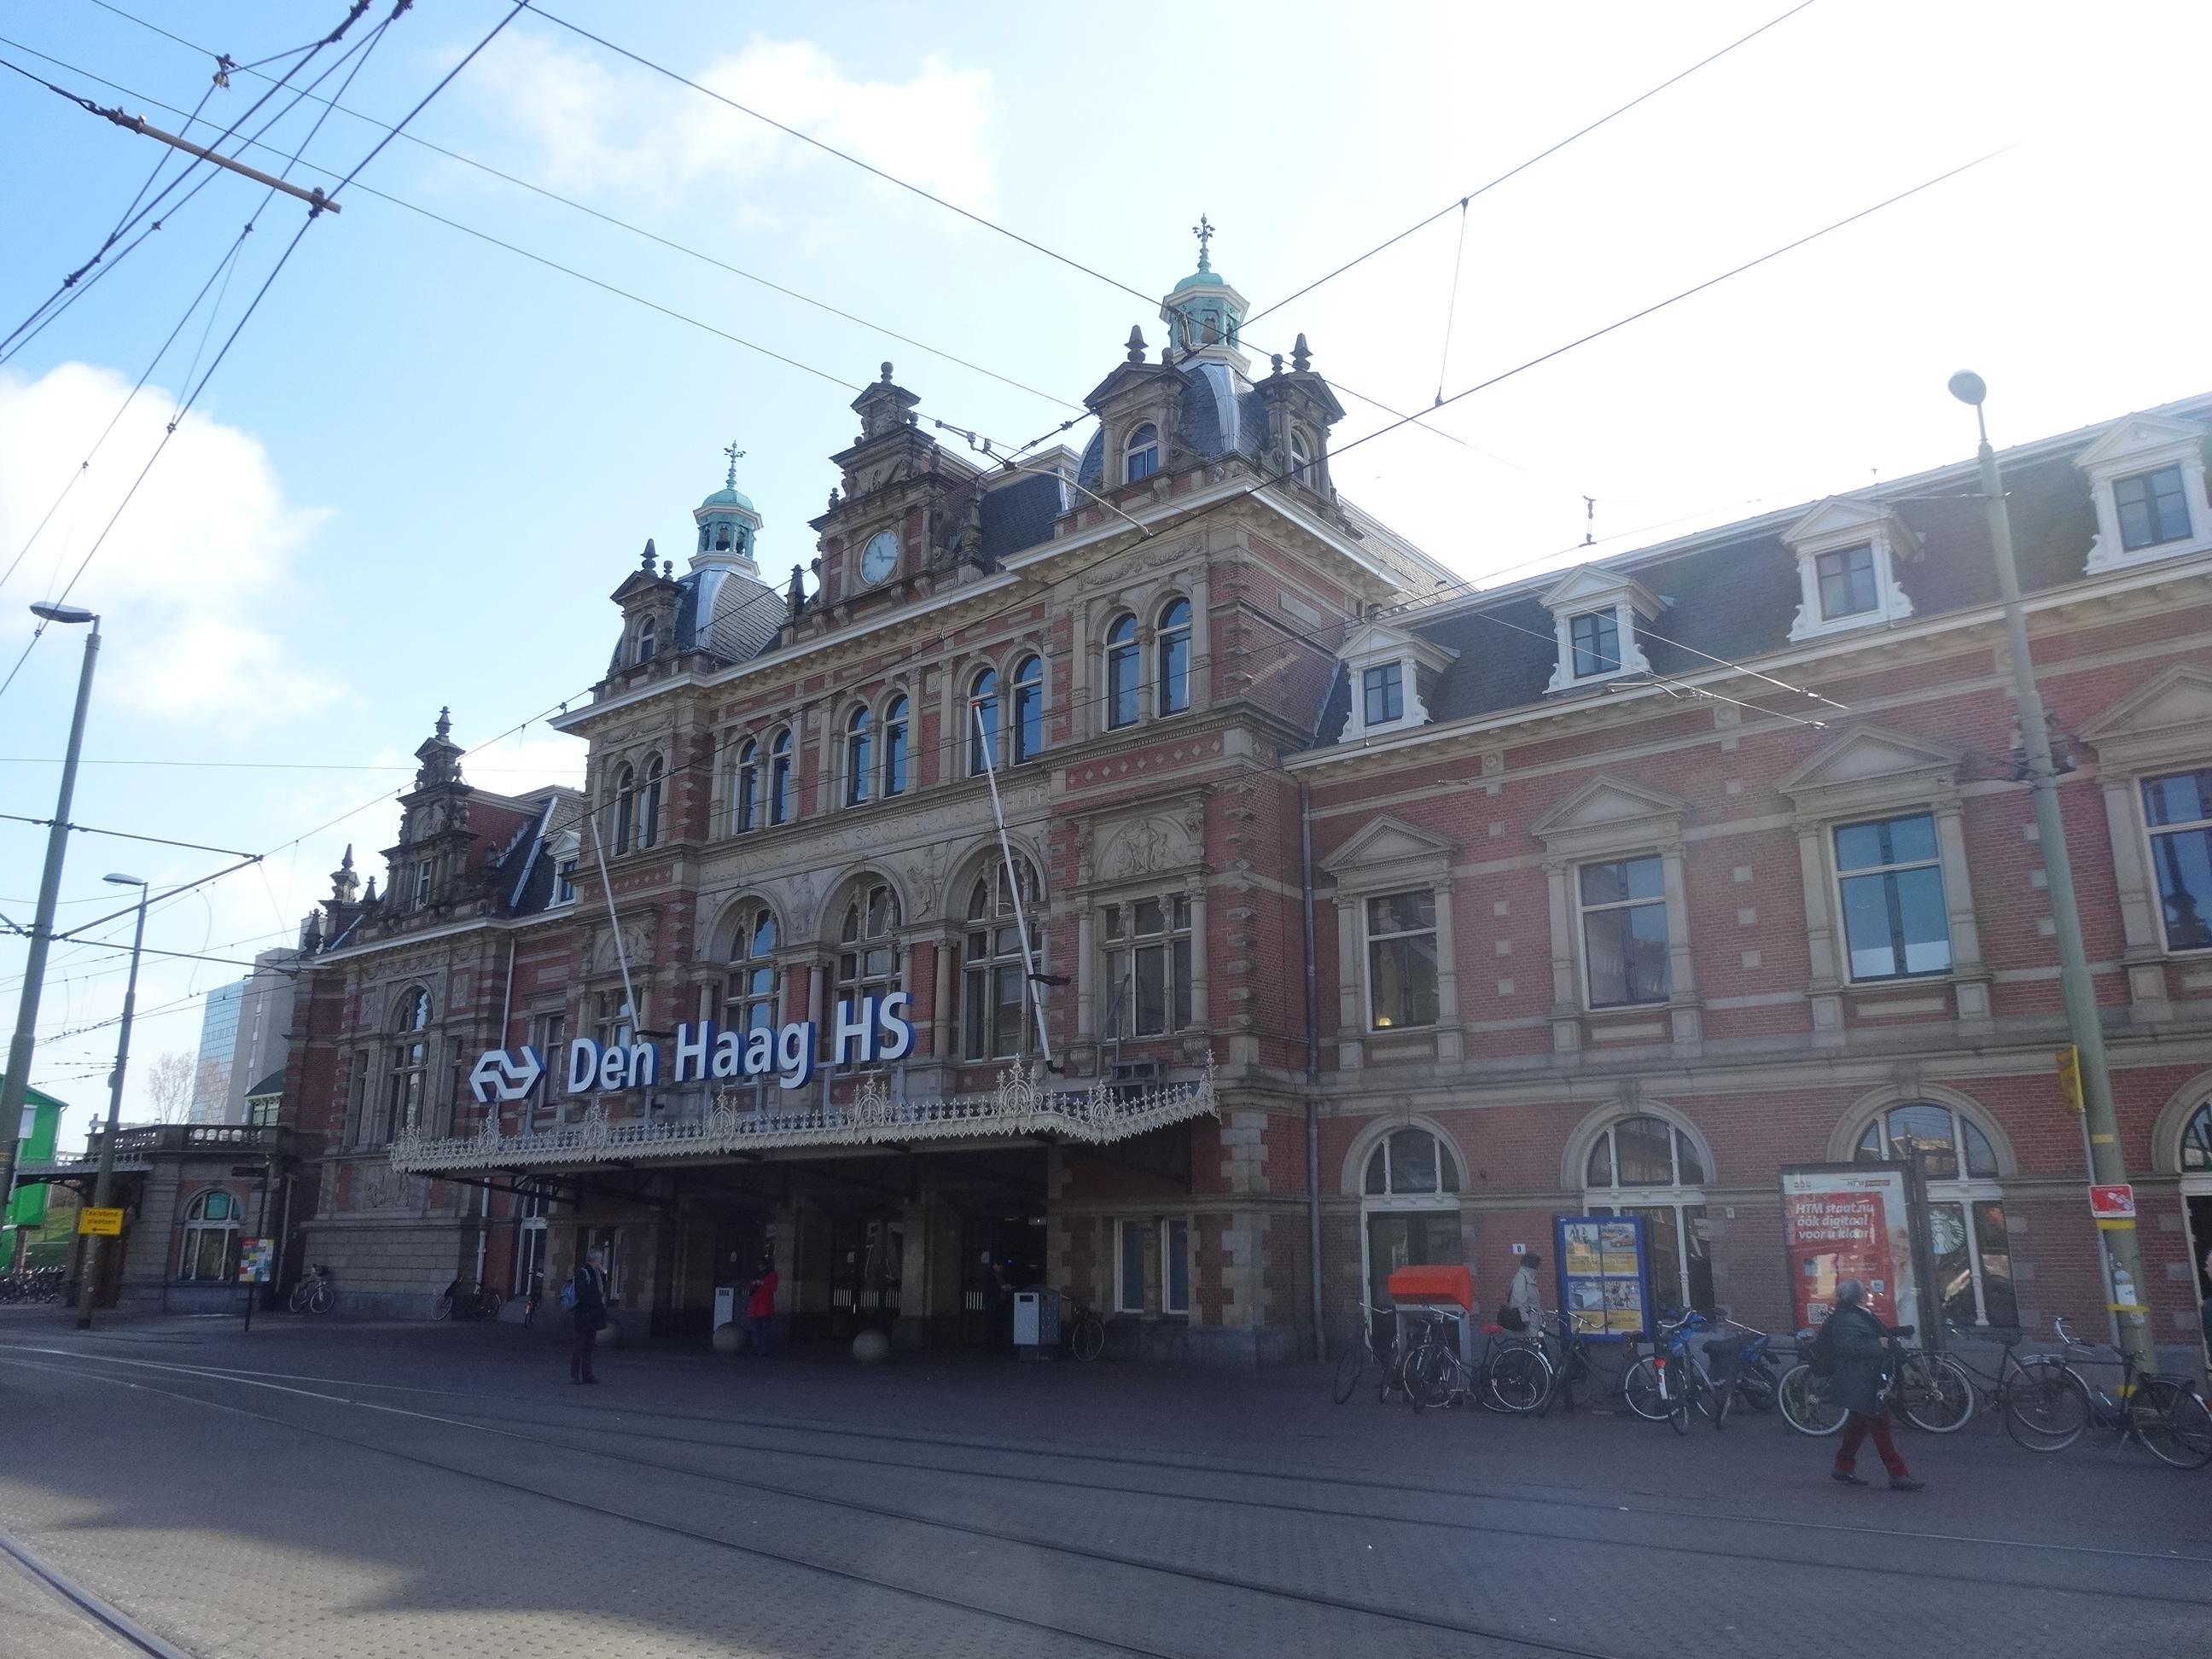 Nederland tussen den haag hollands spoor en den haag for Waldos travel den haag